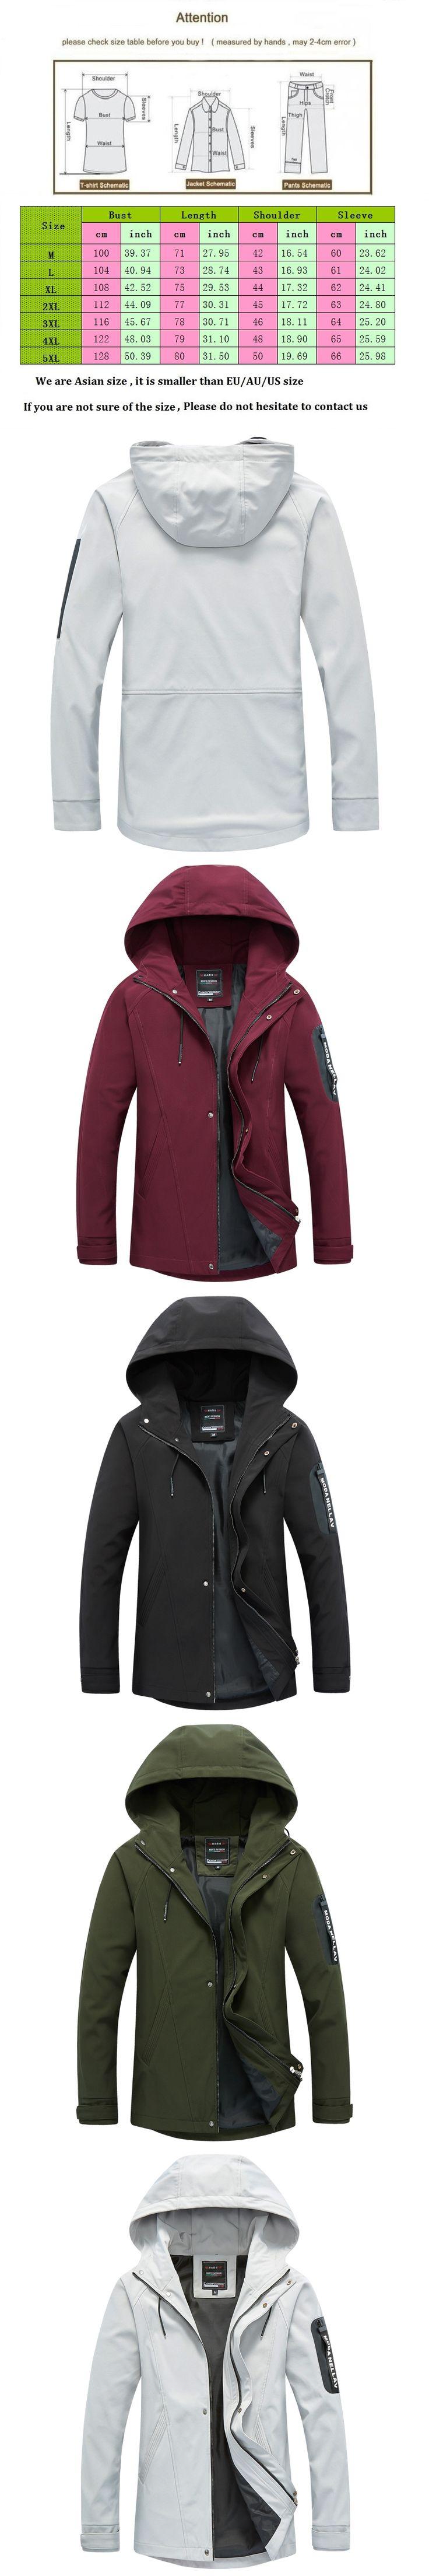 YuWaiJiaRen Mens Hoodies Casual Jackets Brand Clothing Mens Windbreaker Coats Male Outwear 5XL Letter Printed Mens Flight Jacket